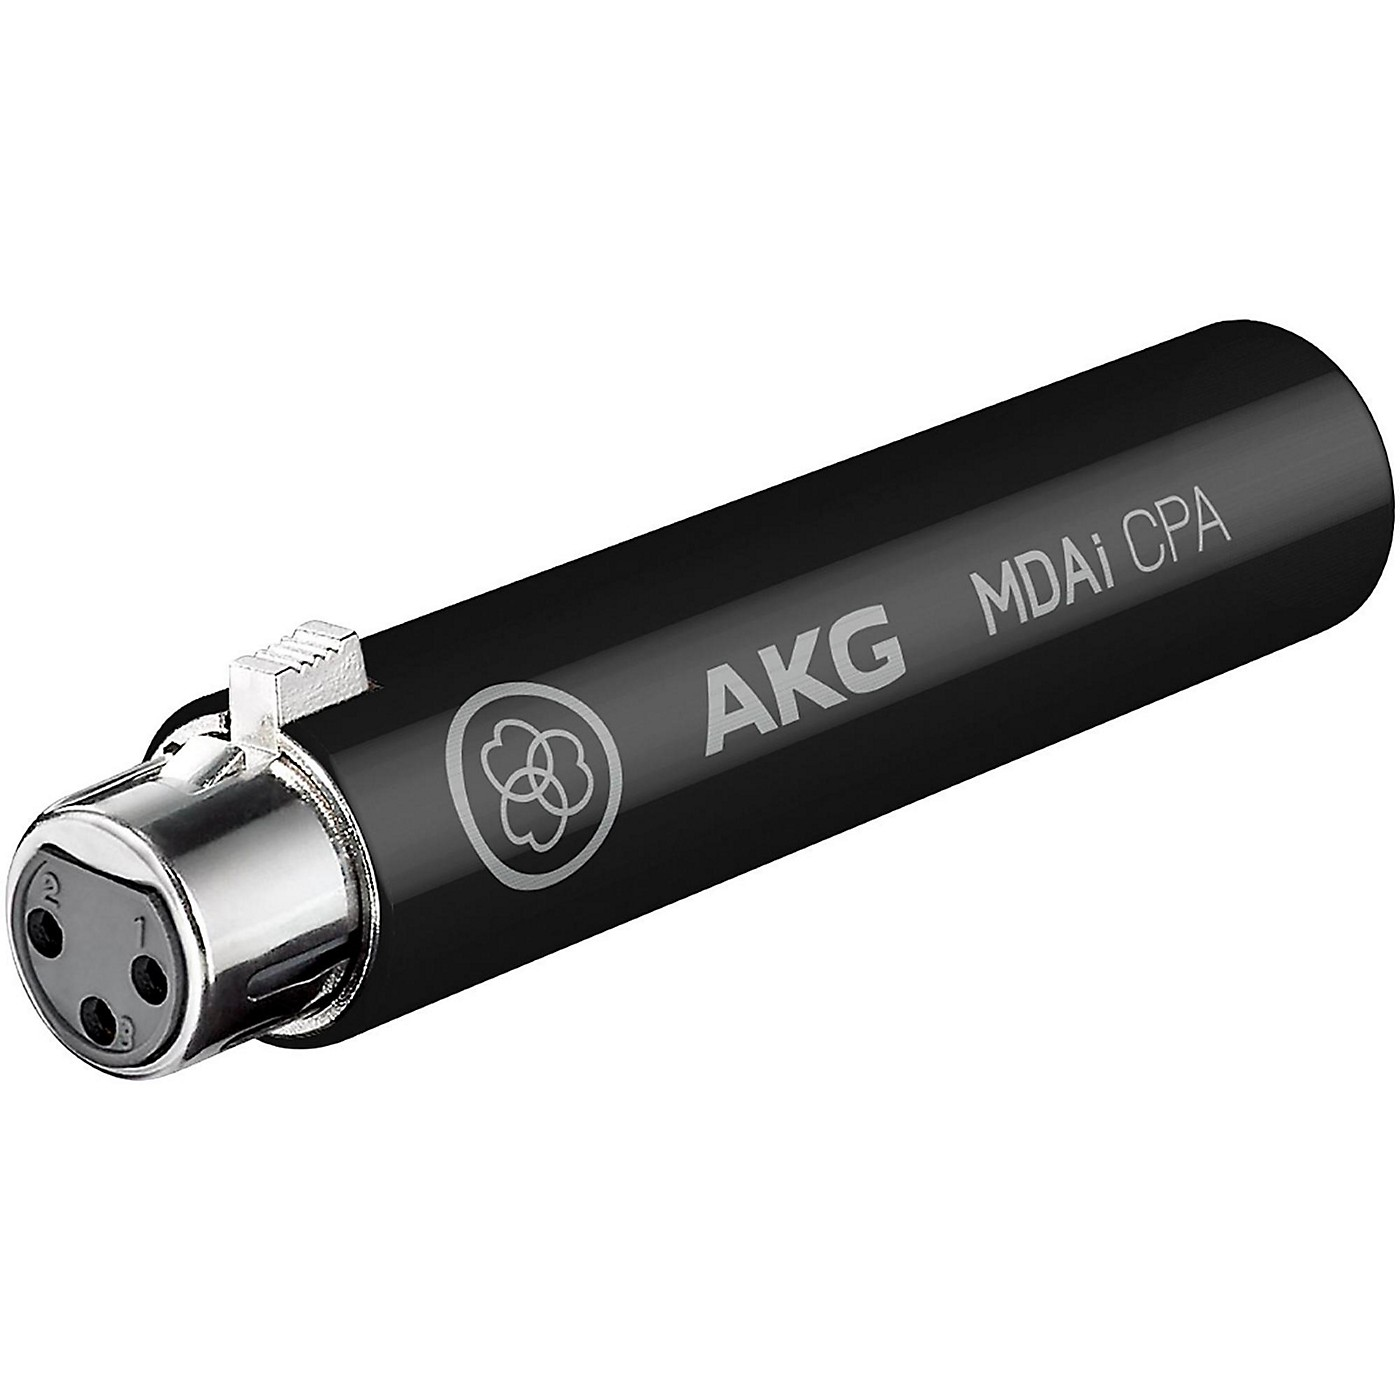 AKG MDAi CPA Dynamic Mic adapter for CPA/ioSYS thumbnail